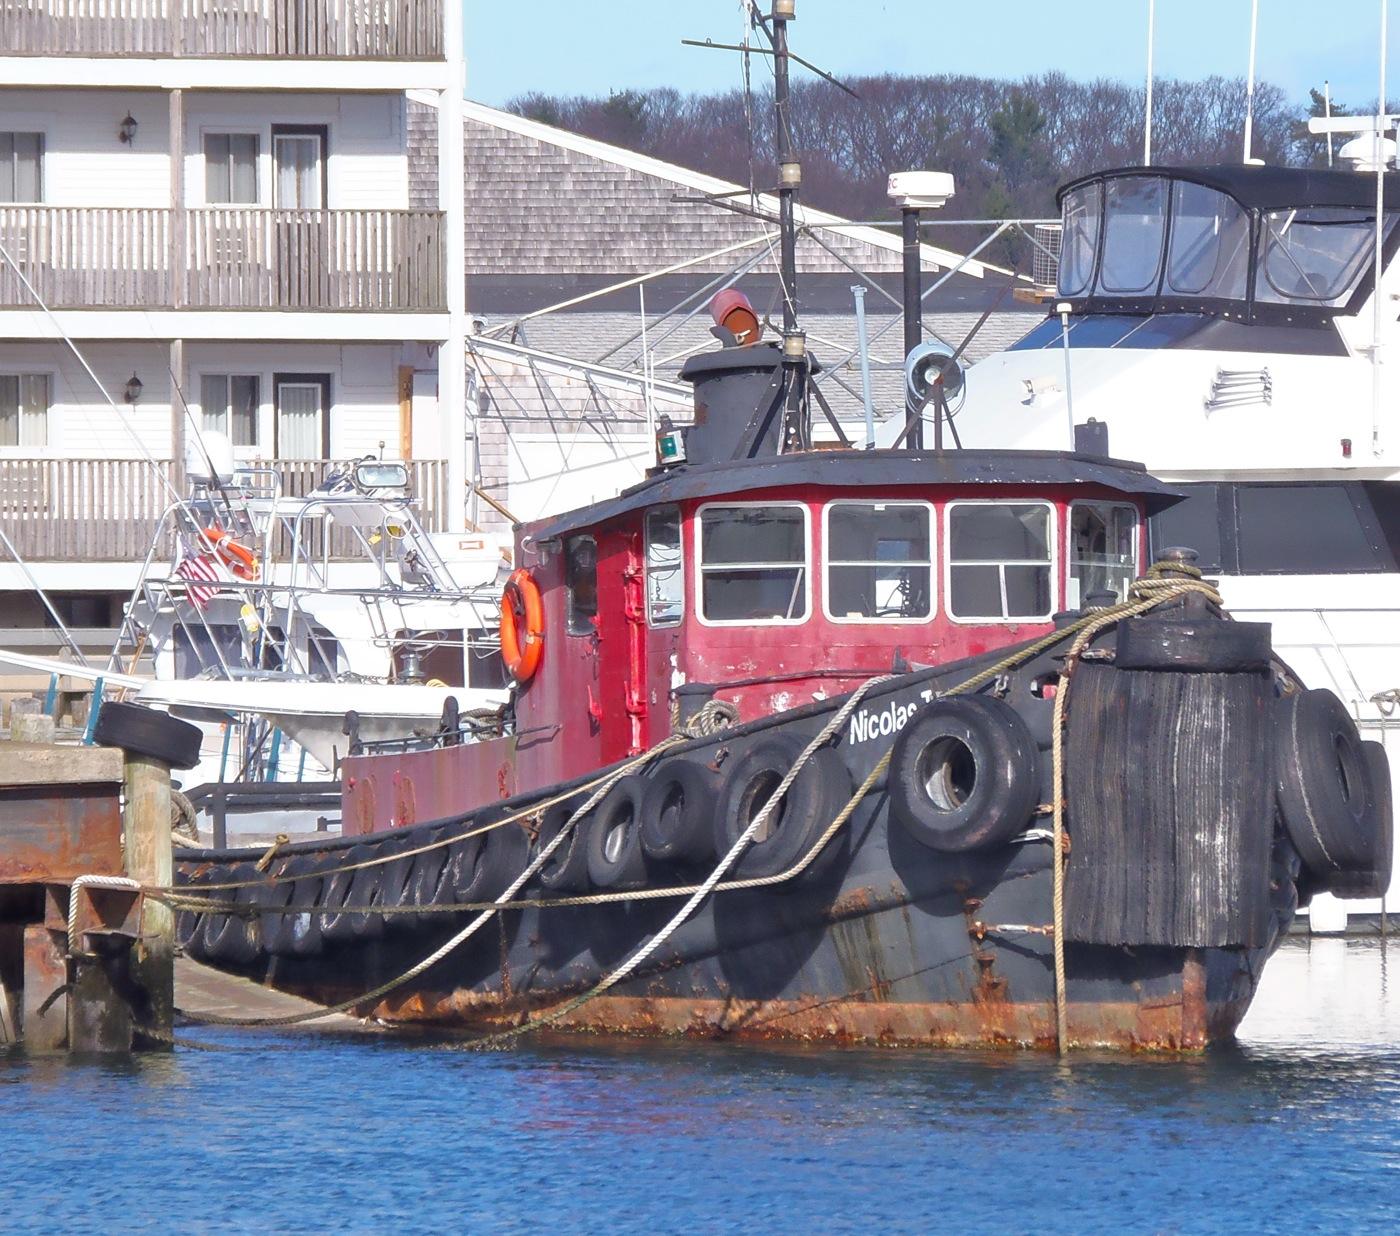 Western sea fishing tugster a waterblog for City island fishing